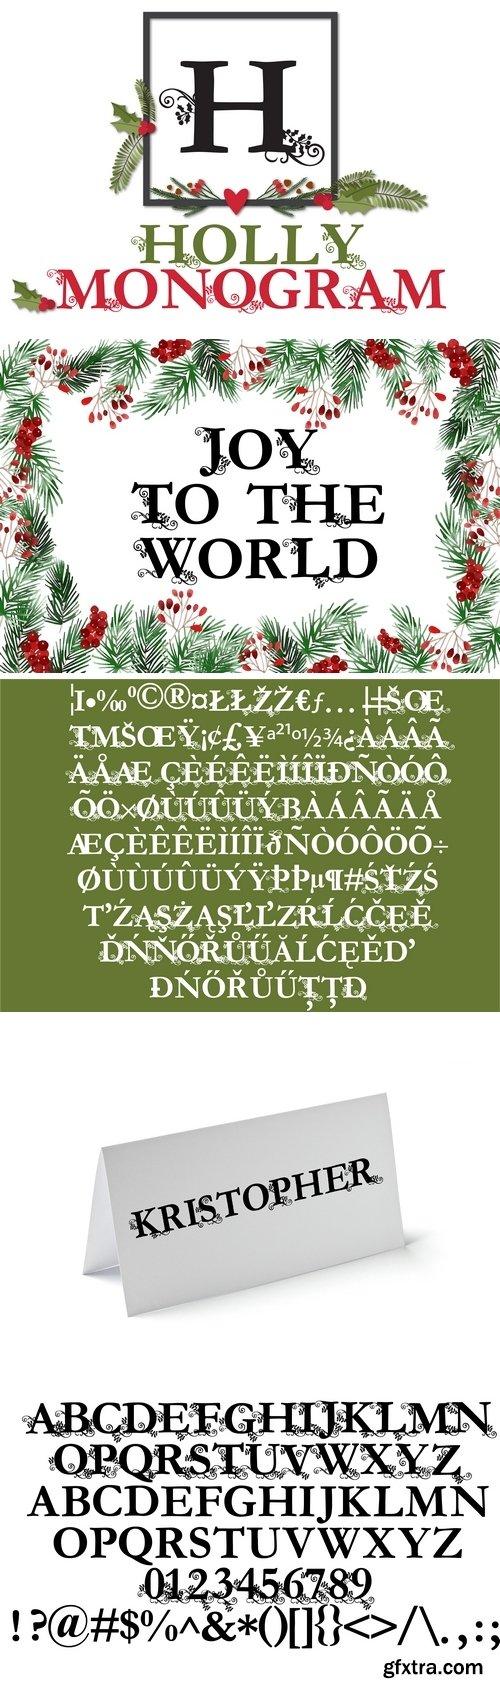 Fontbundles - PN Holly Monogram 182400